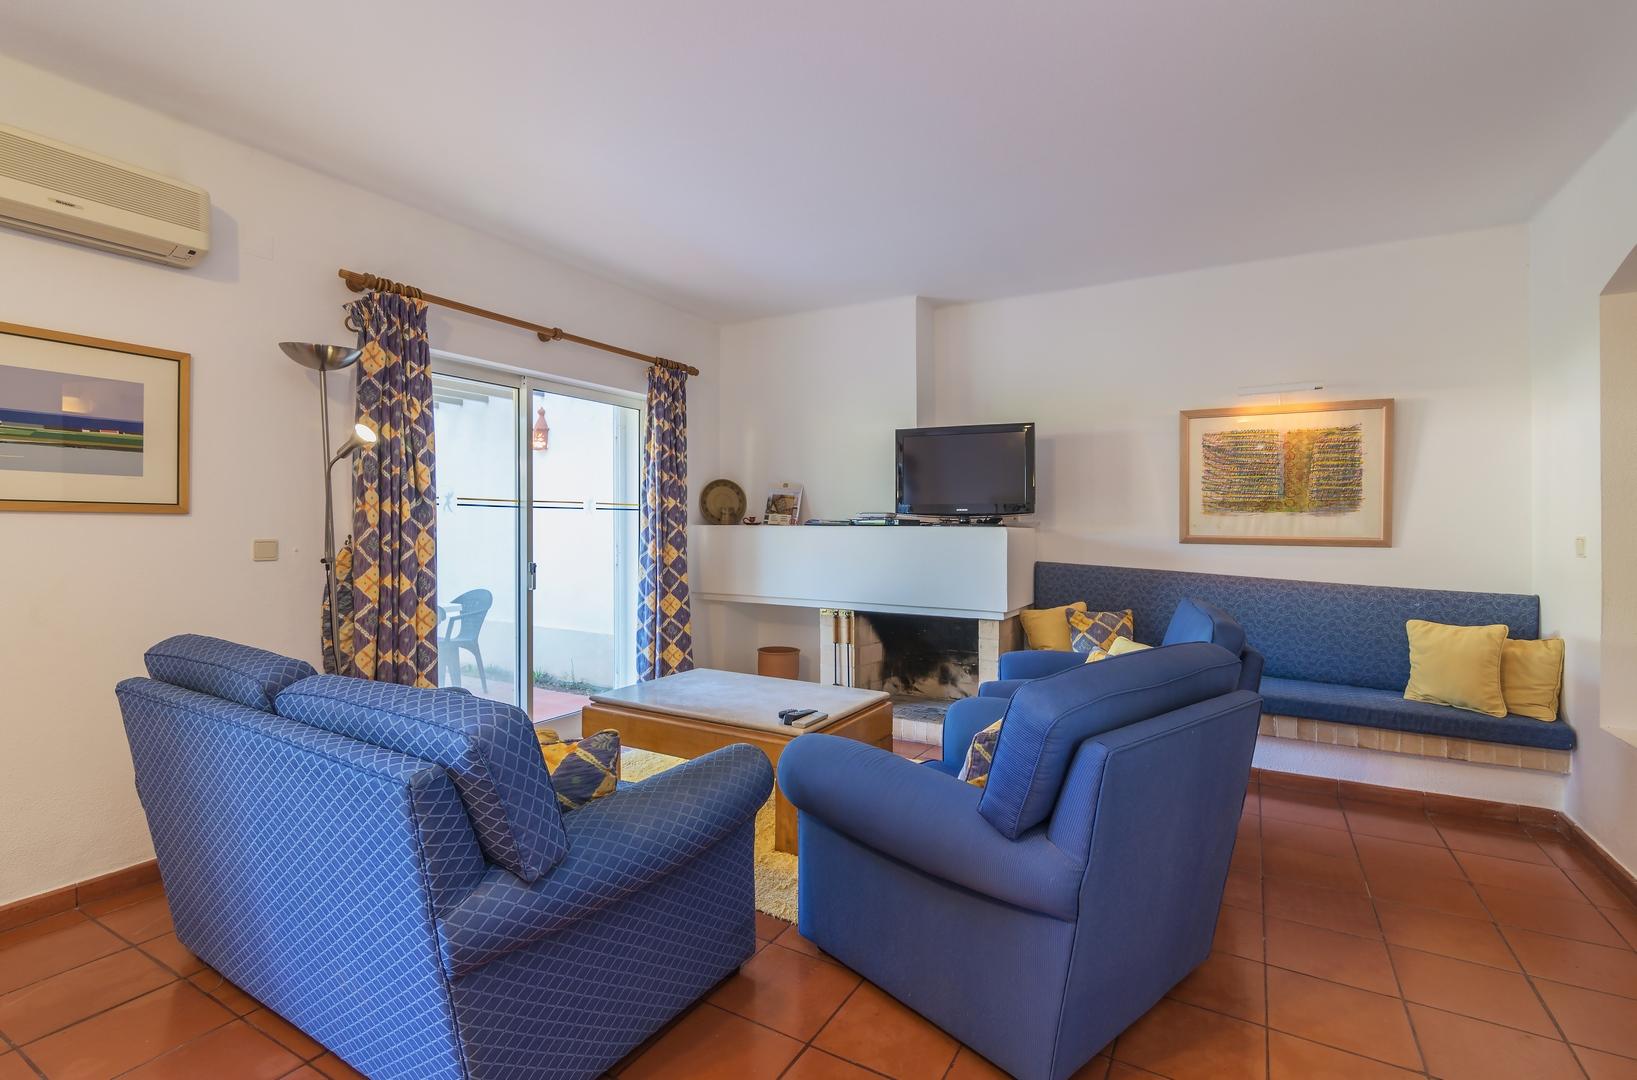 2 Bedroom Townhouse For Sale In Vilar do Golfe (5)